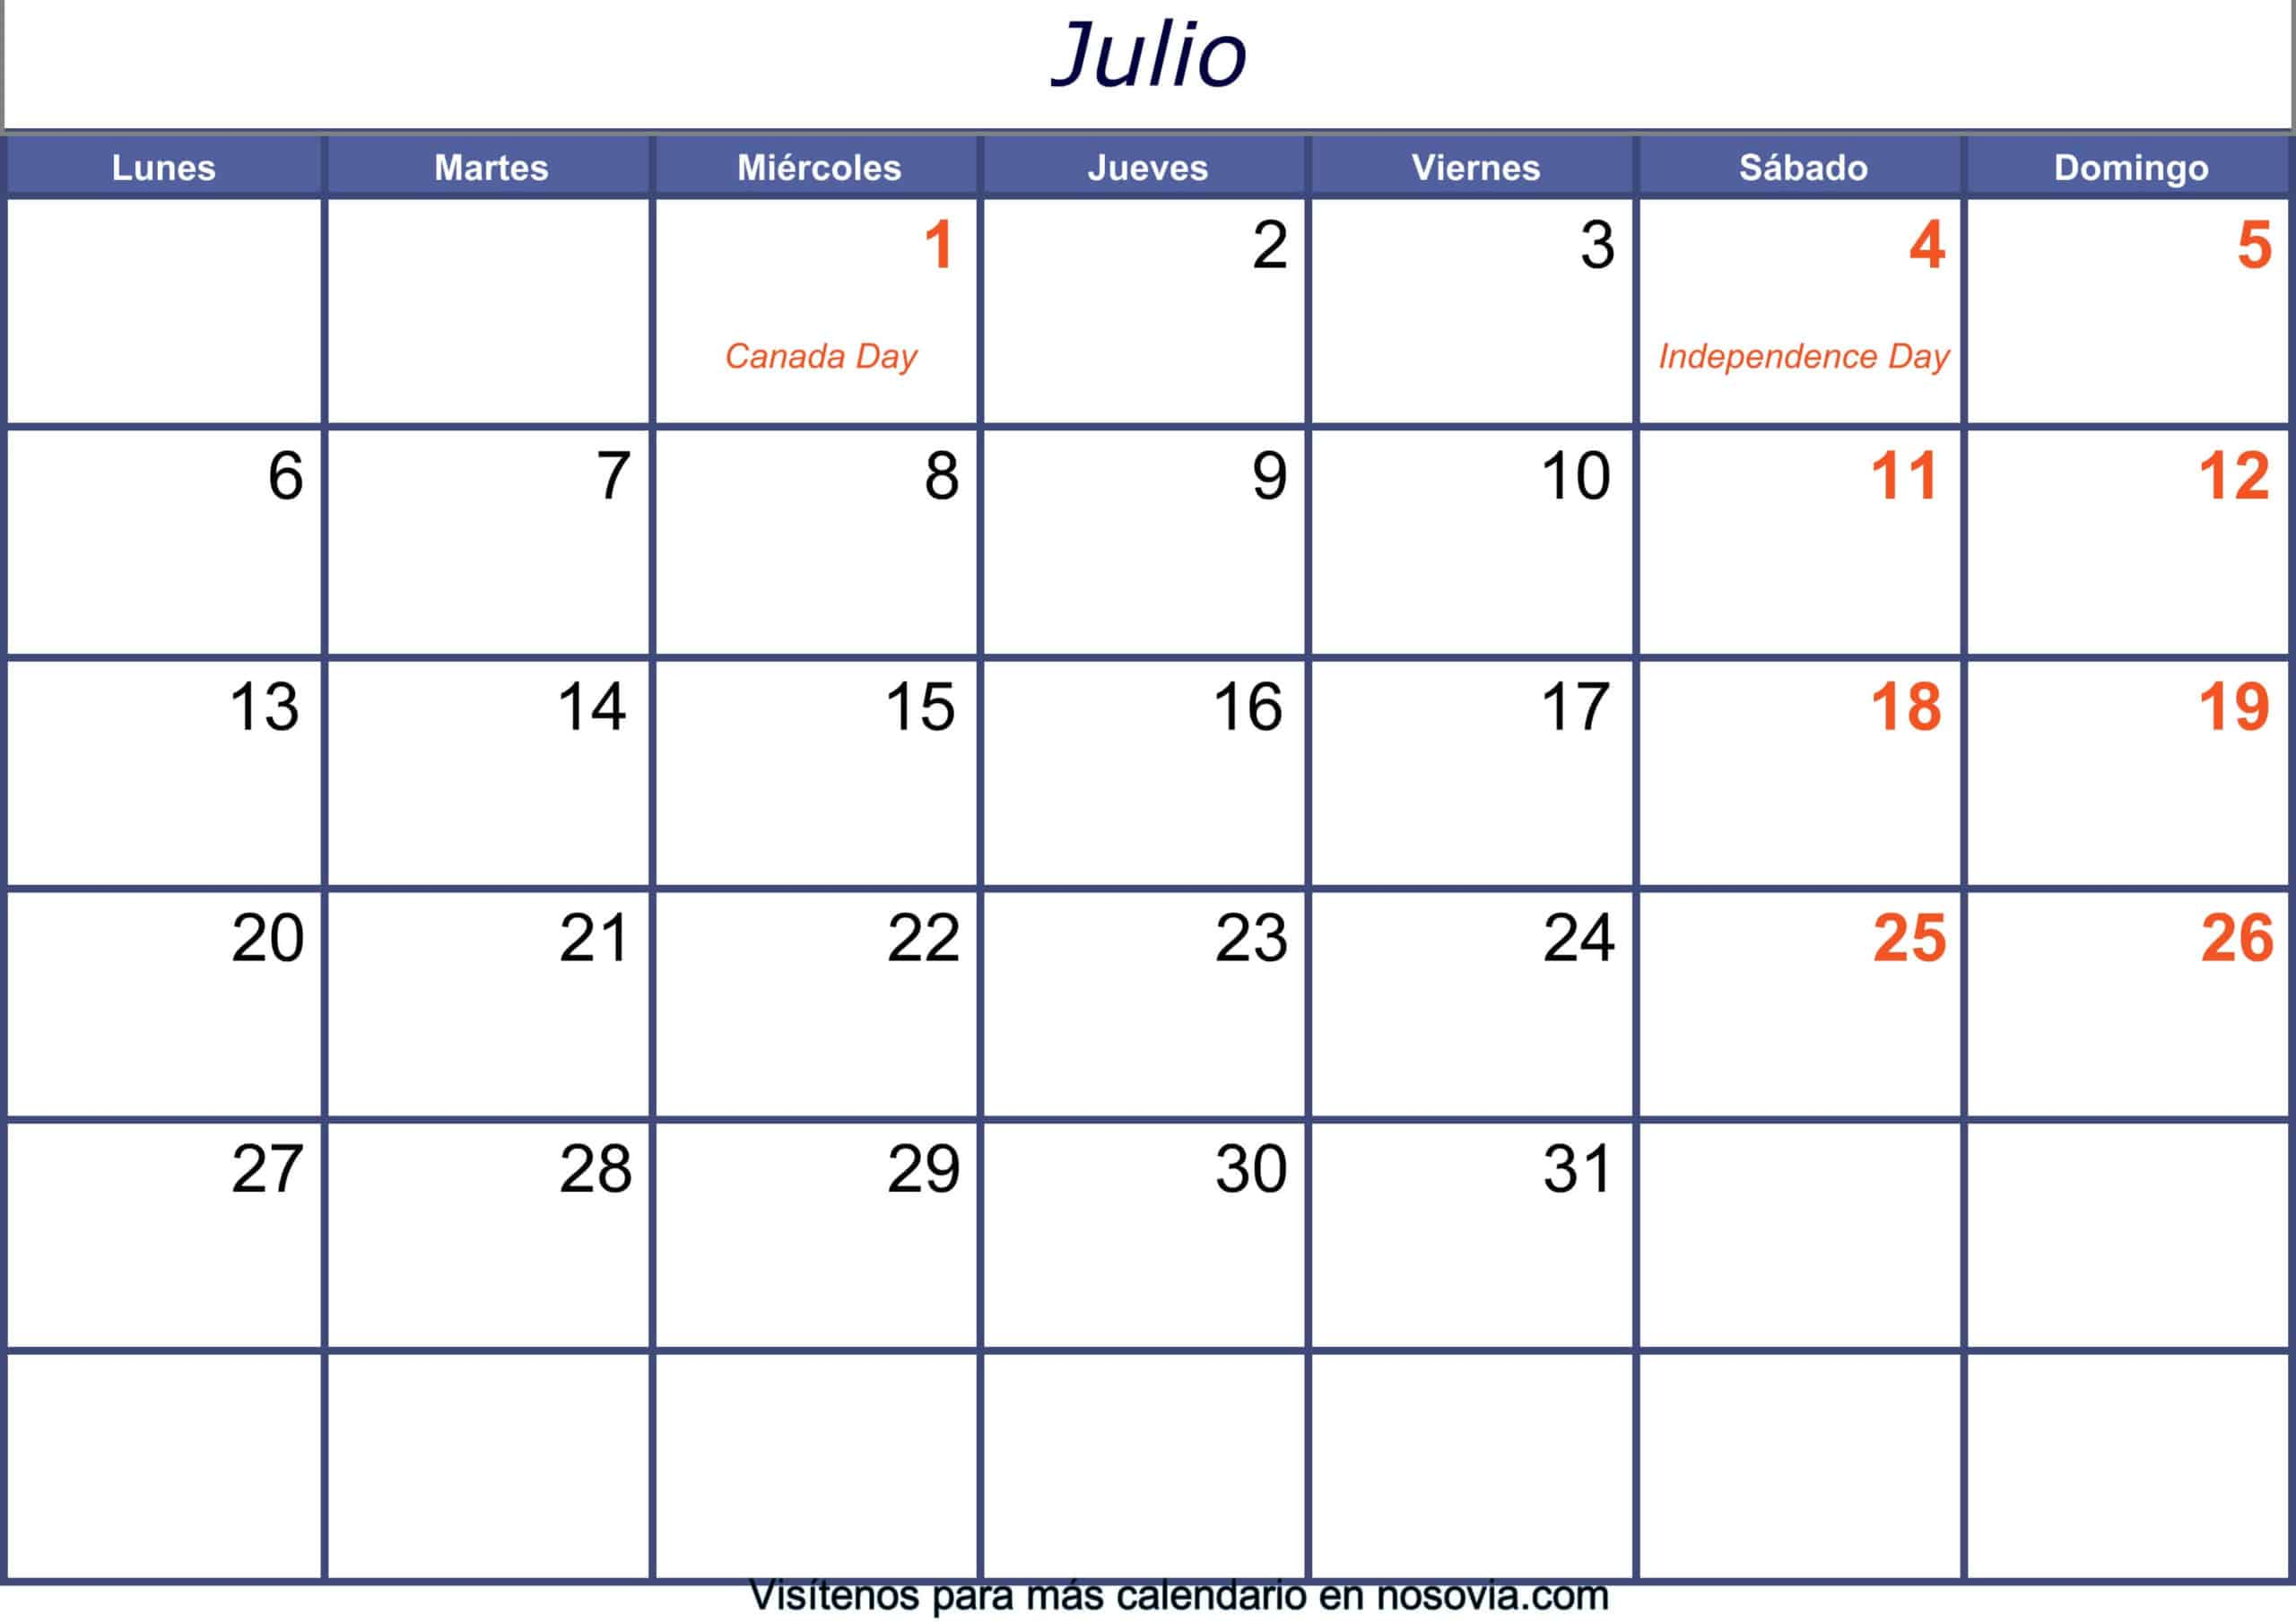 Calendario-julio-2020-con-festivos-para-imprimir